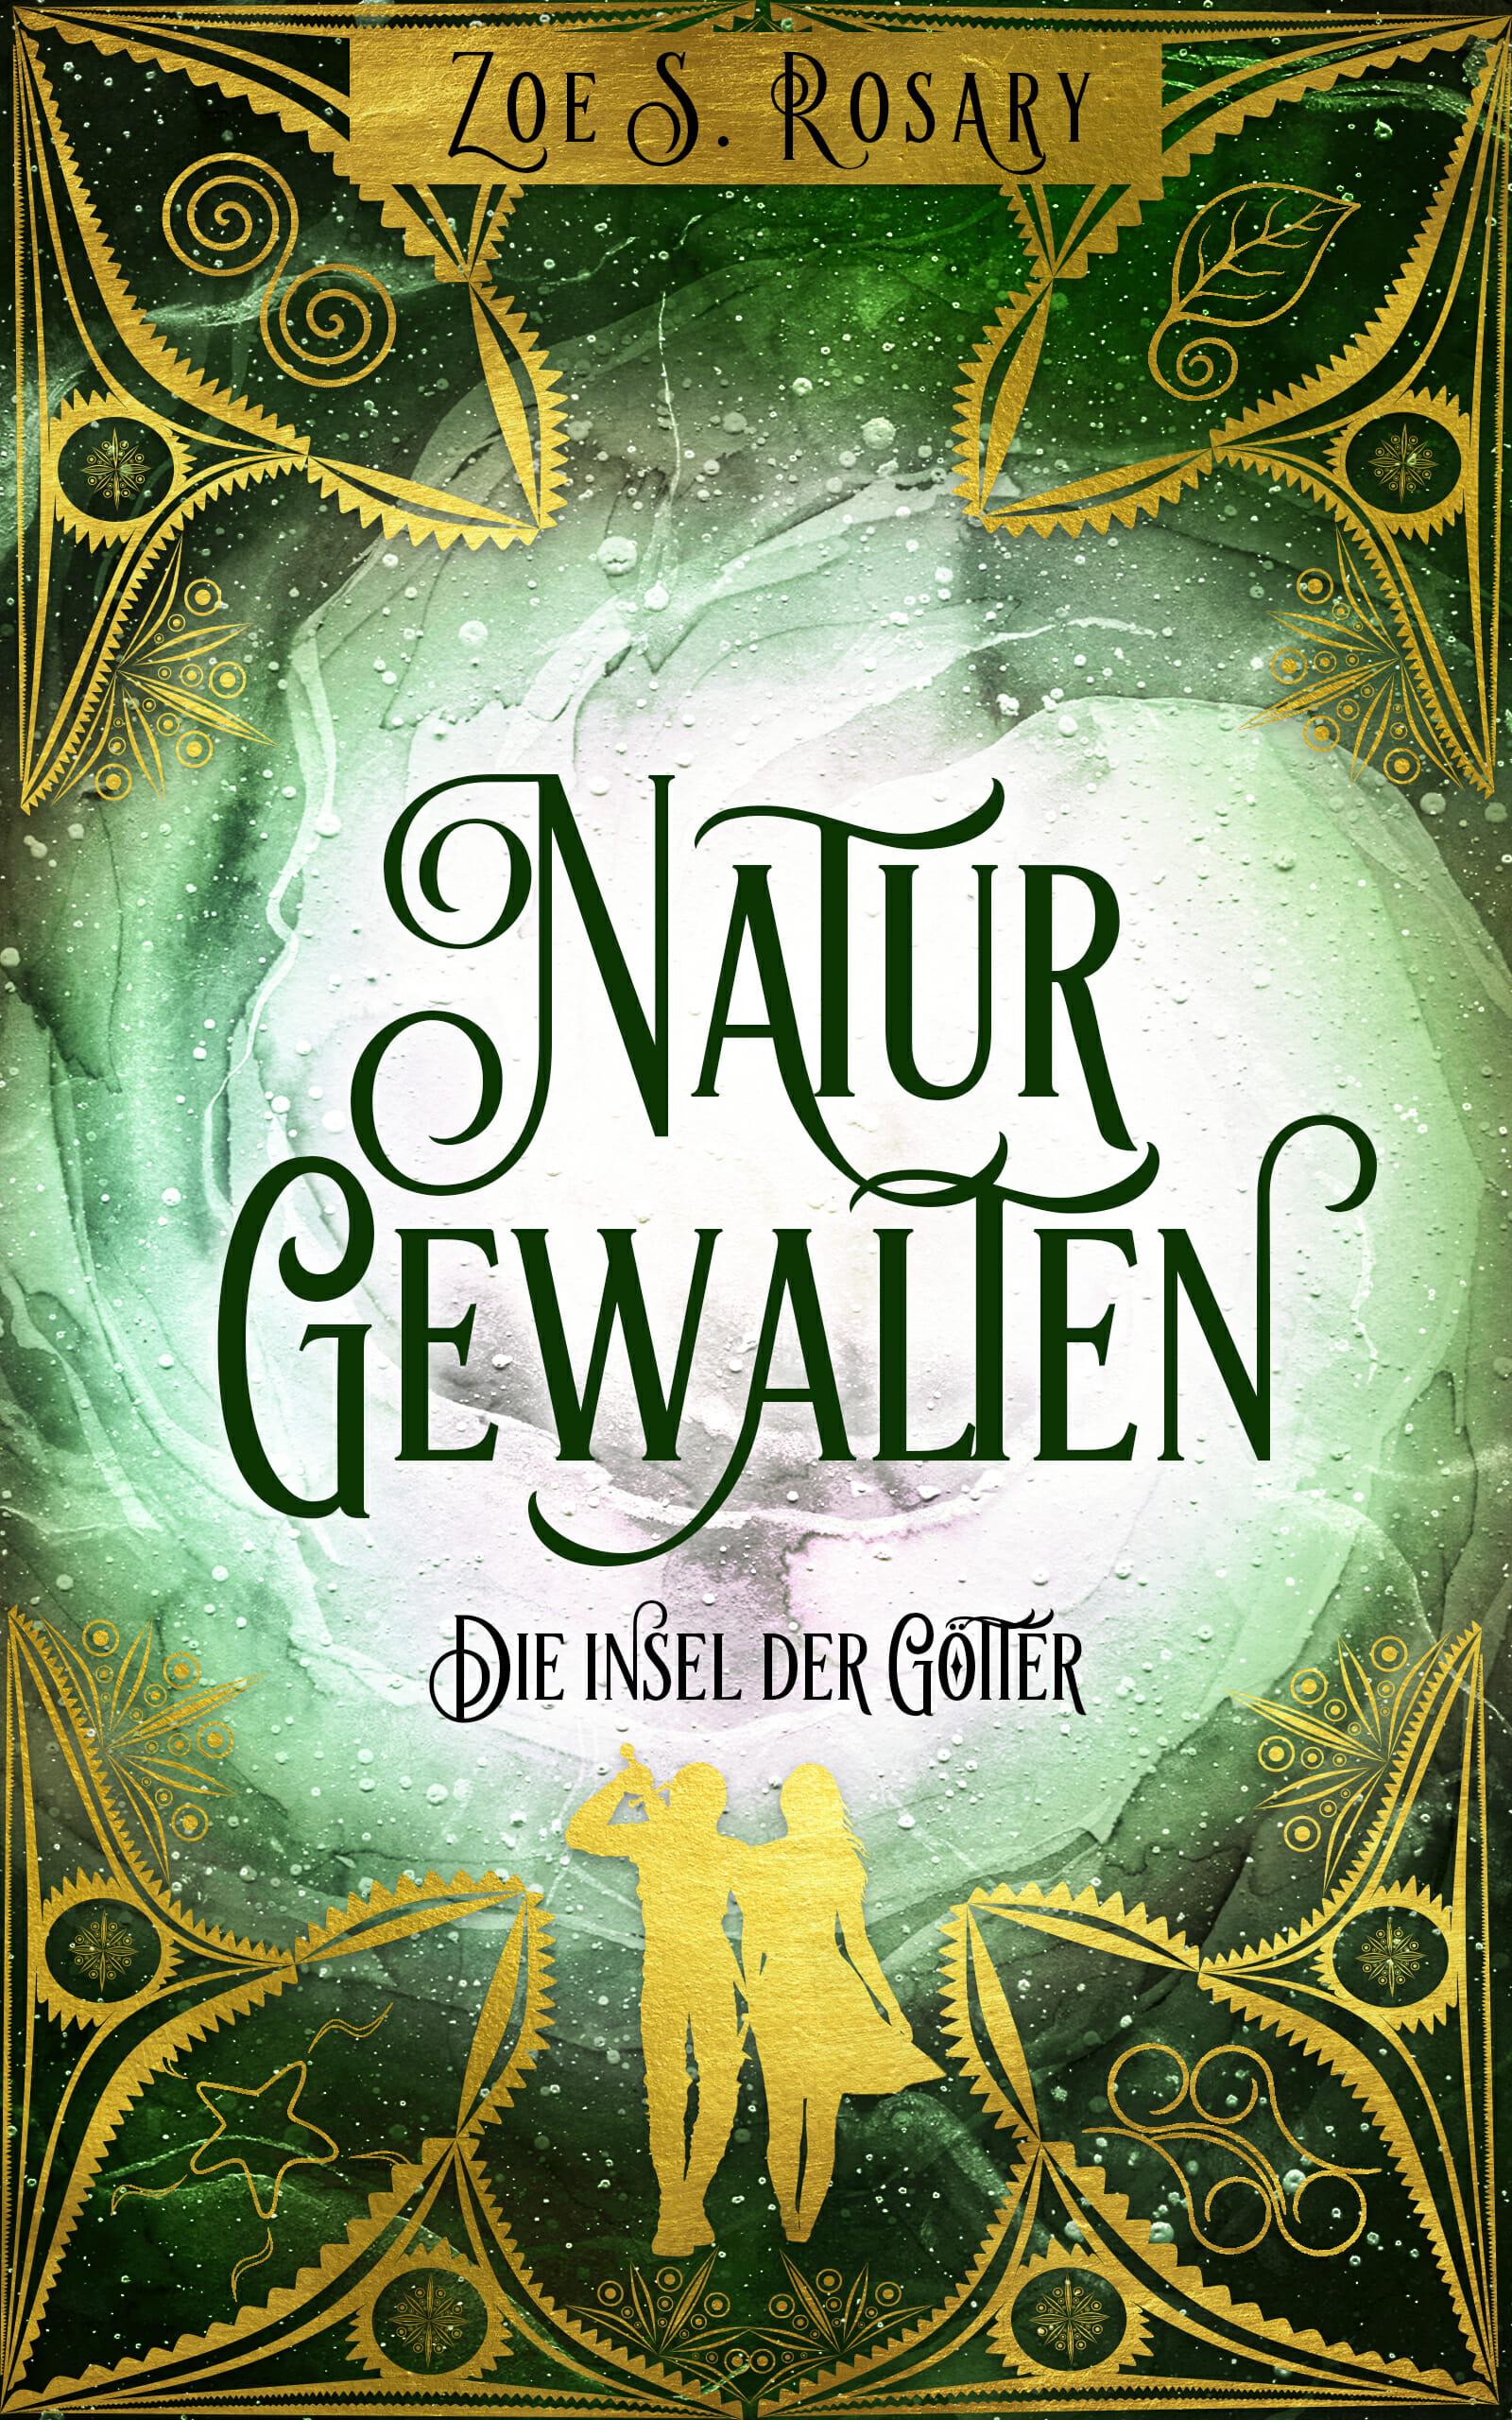 Naturgewalten Band 2 - Das Cover